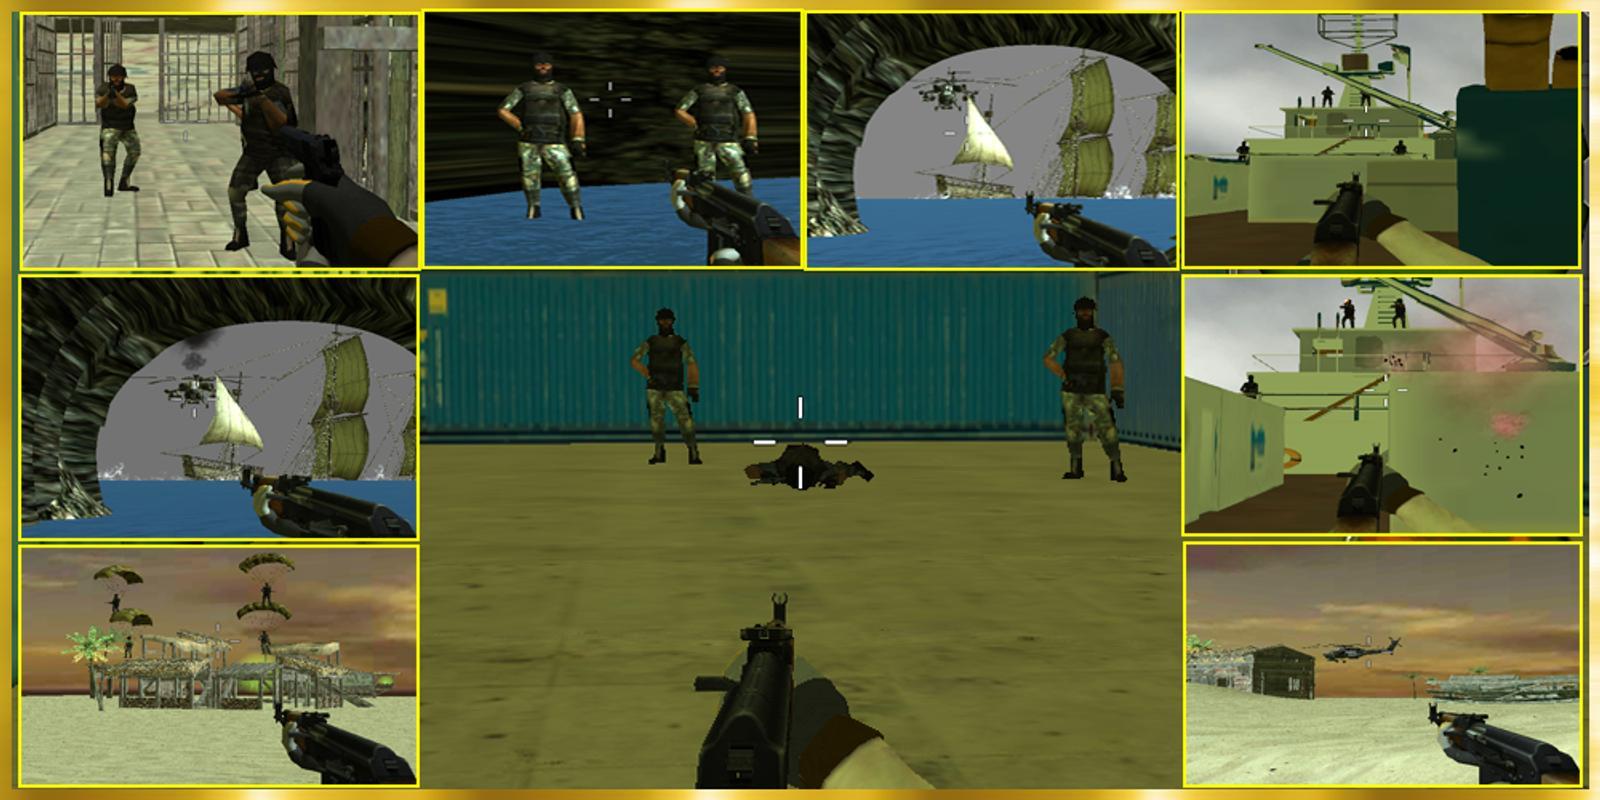 Cool Math Games Mission Commando